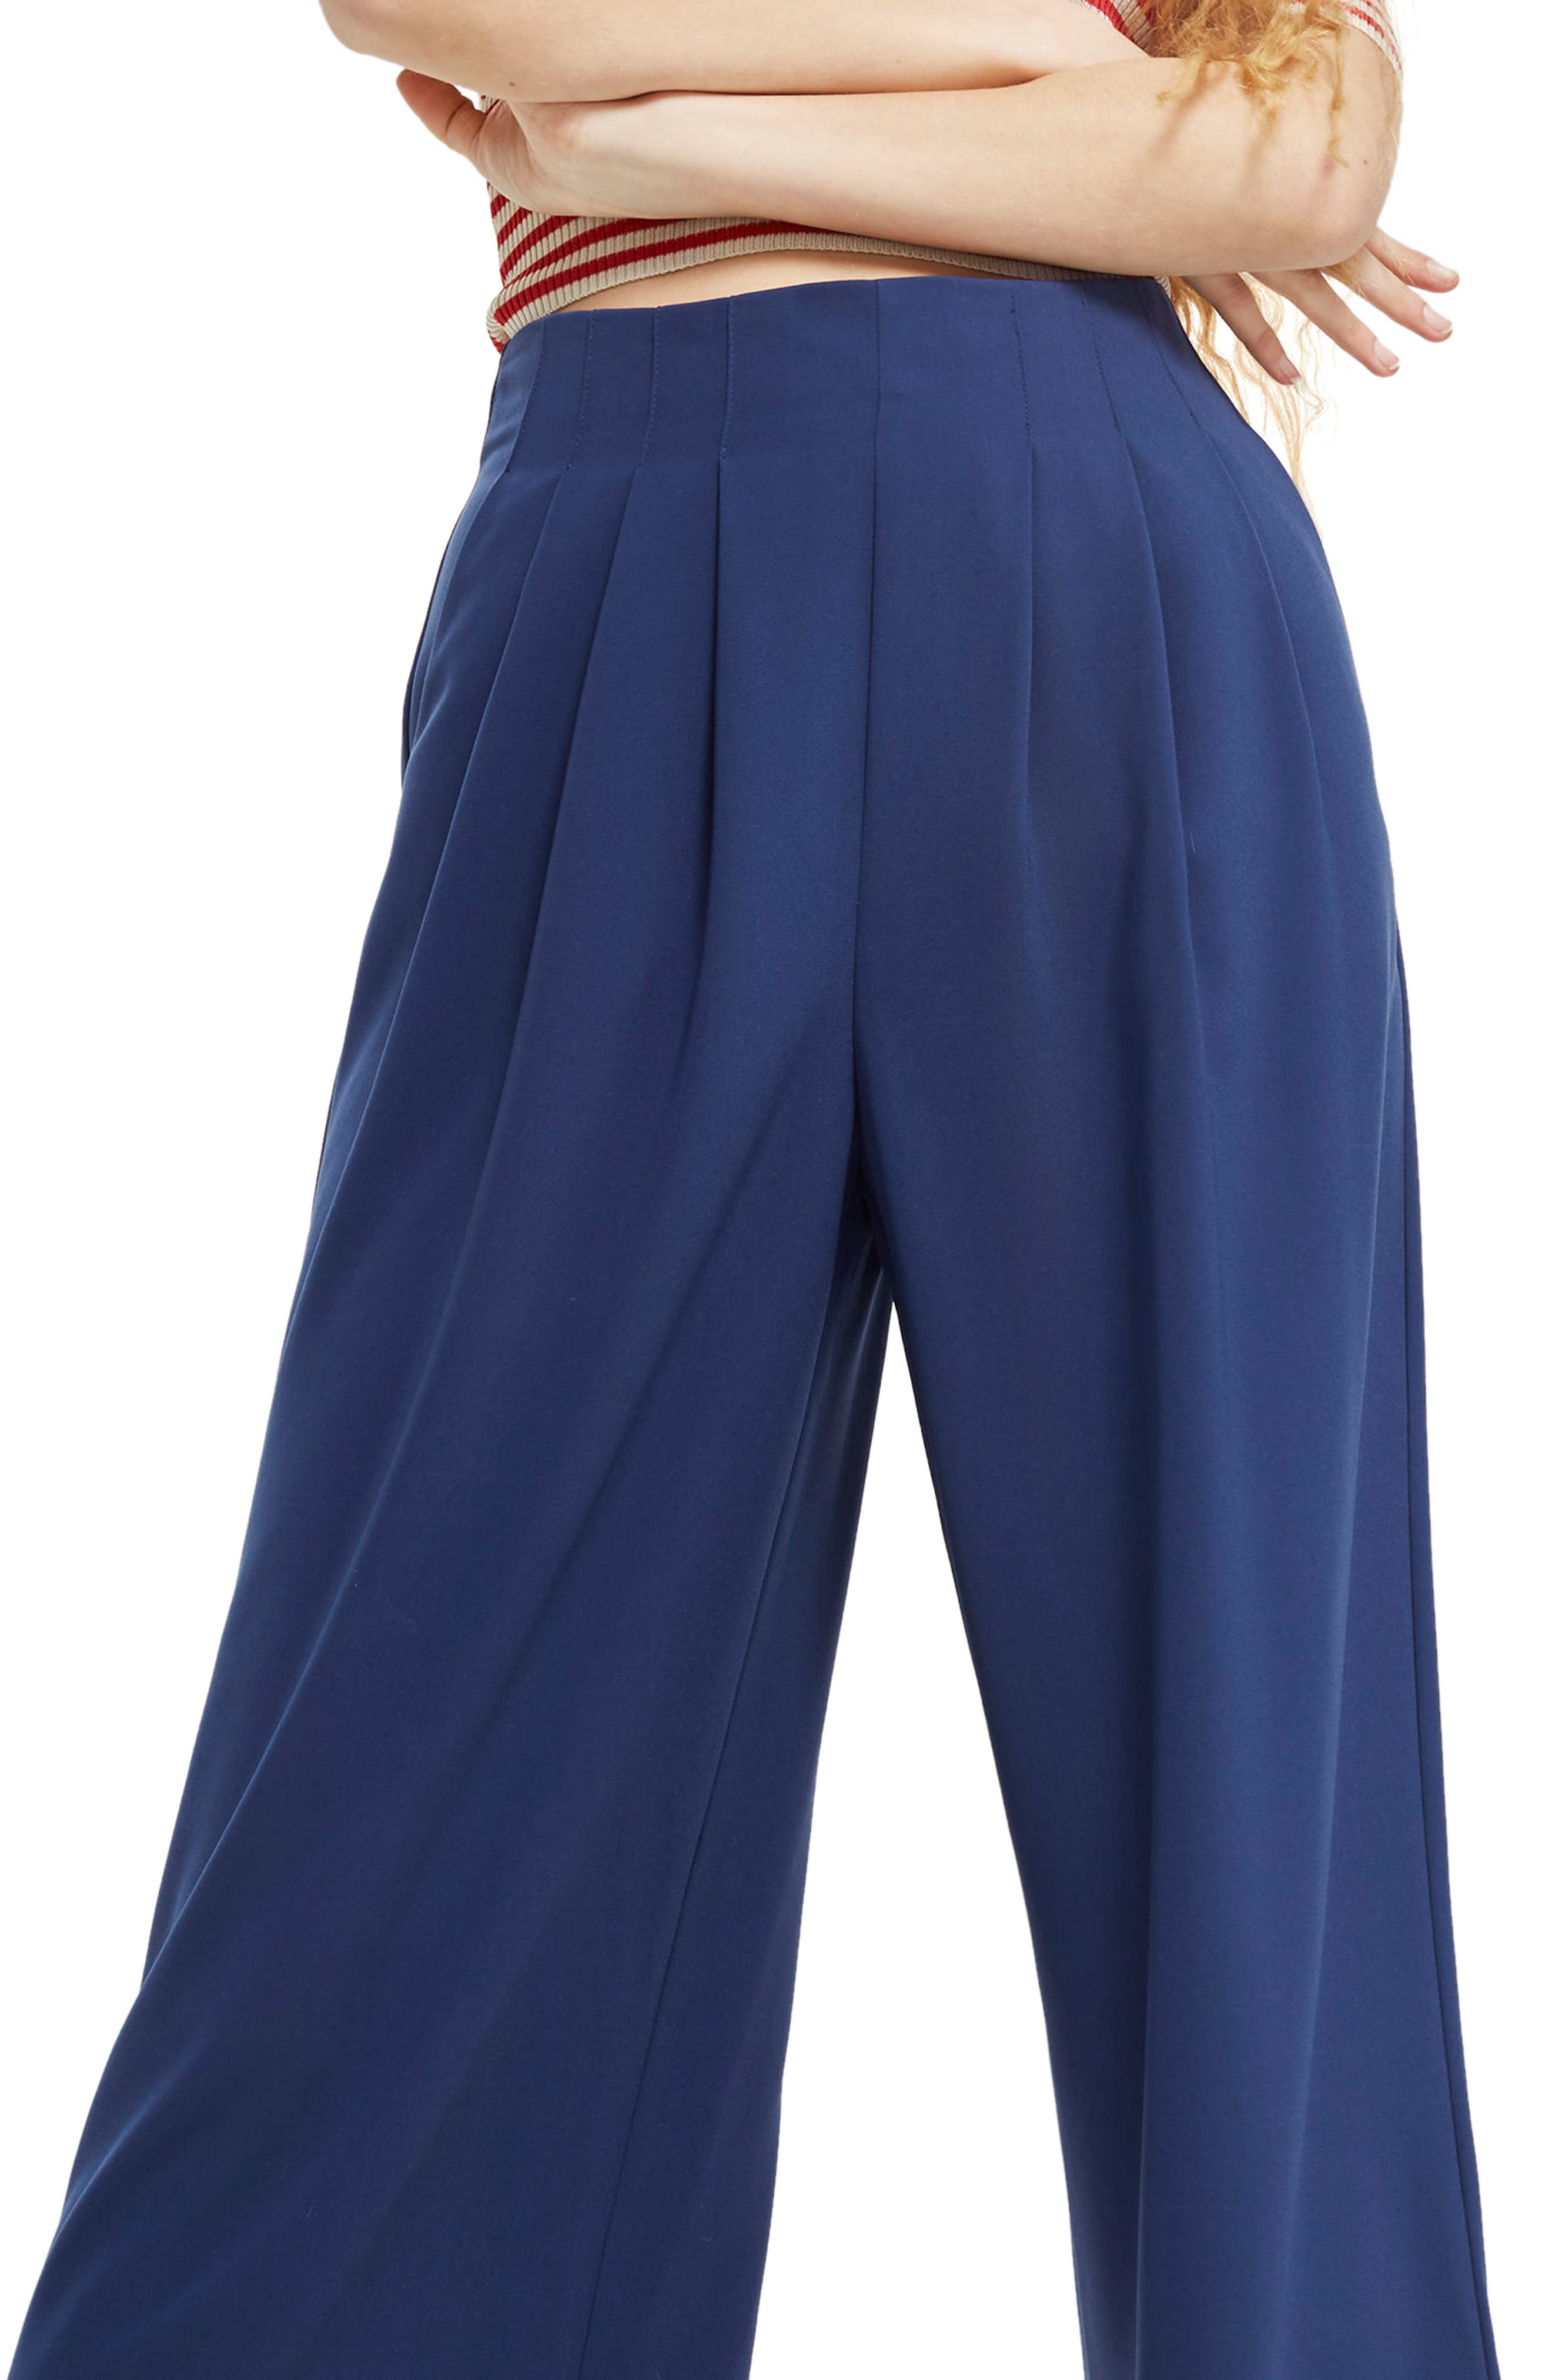 Ivy Crop Wide Leg Trousers,                             Alternate thumbnail 3, color,                             Navy Blue